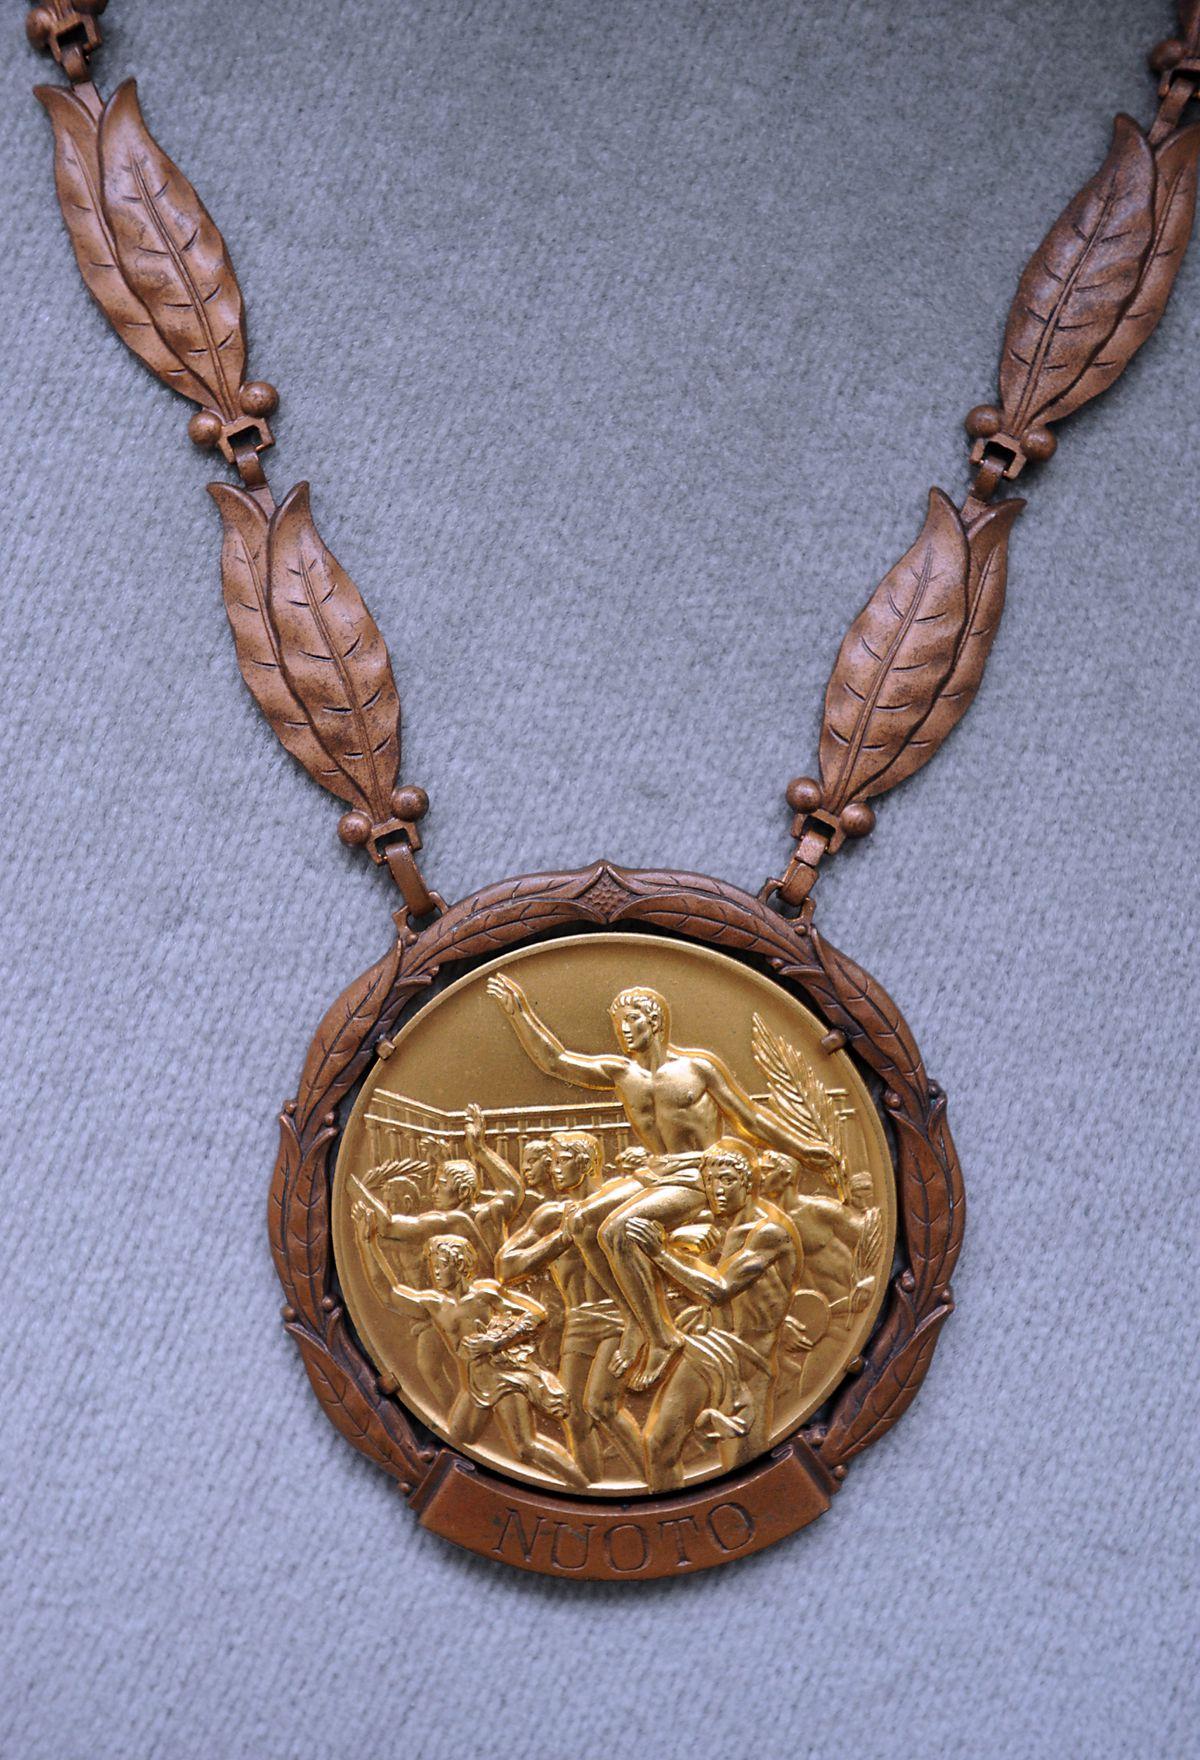 Anita's Olympic gold medal